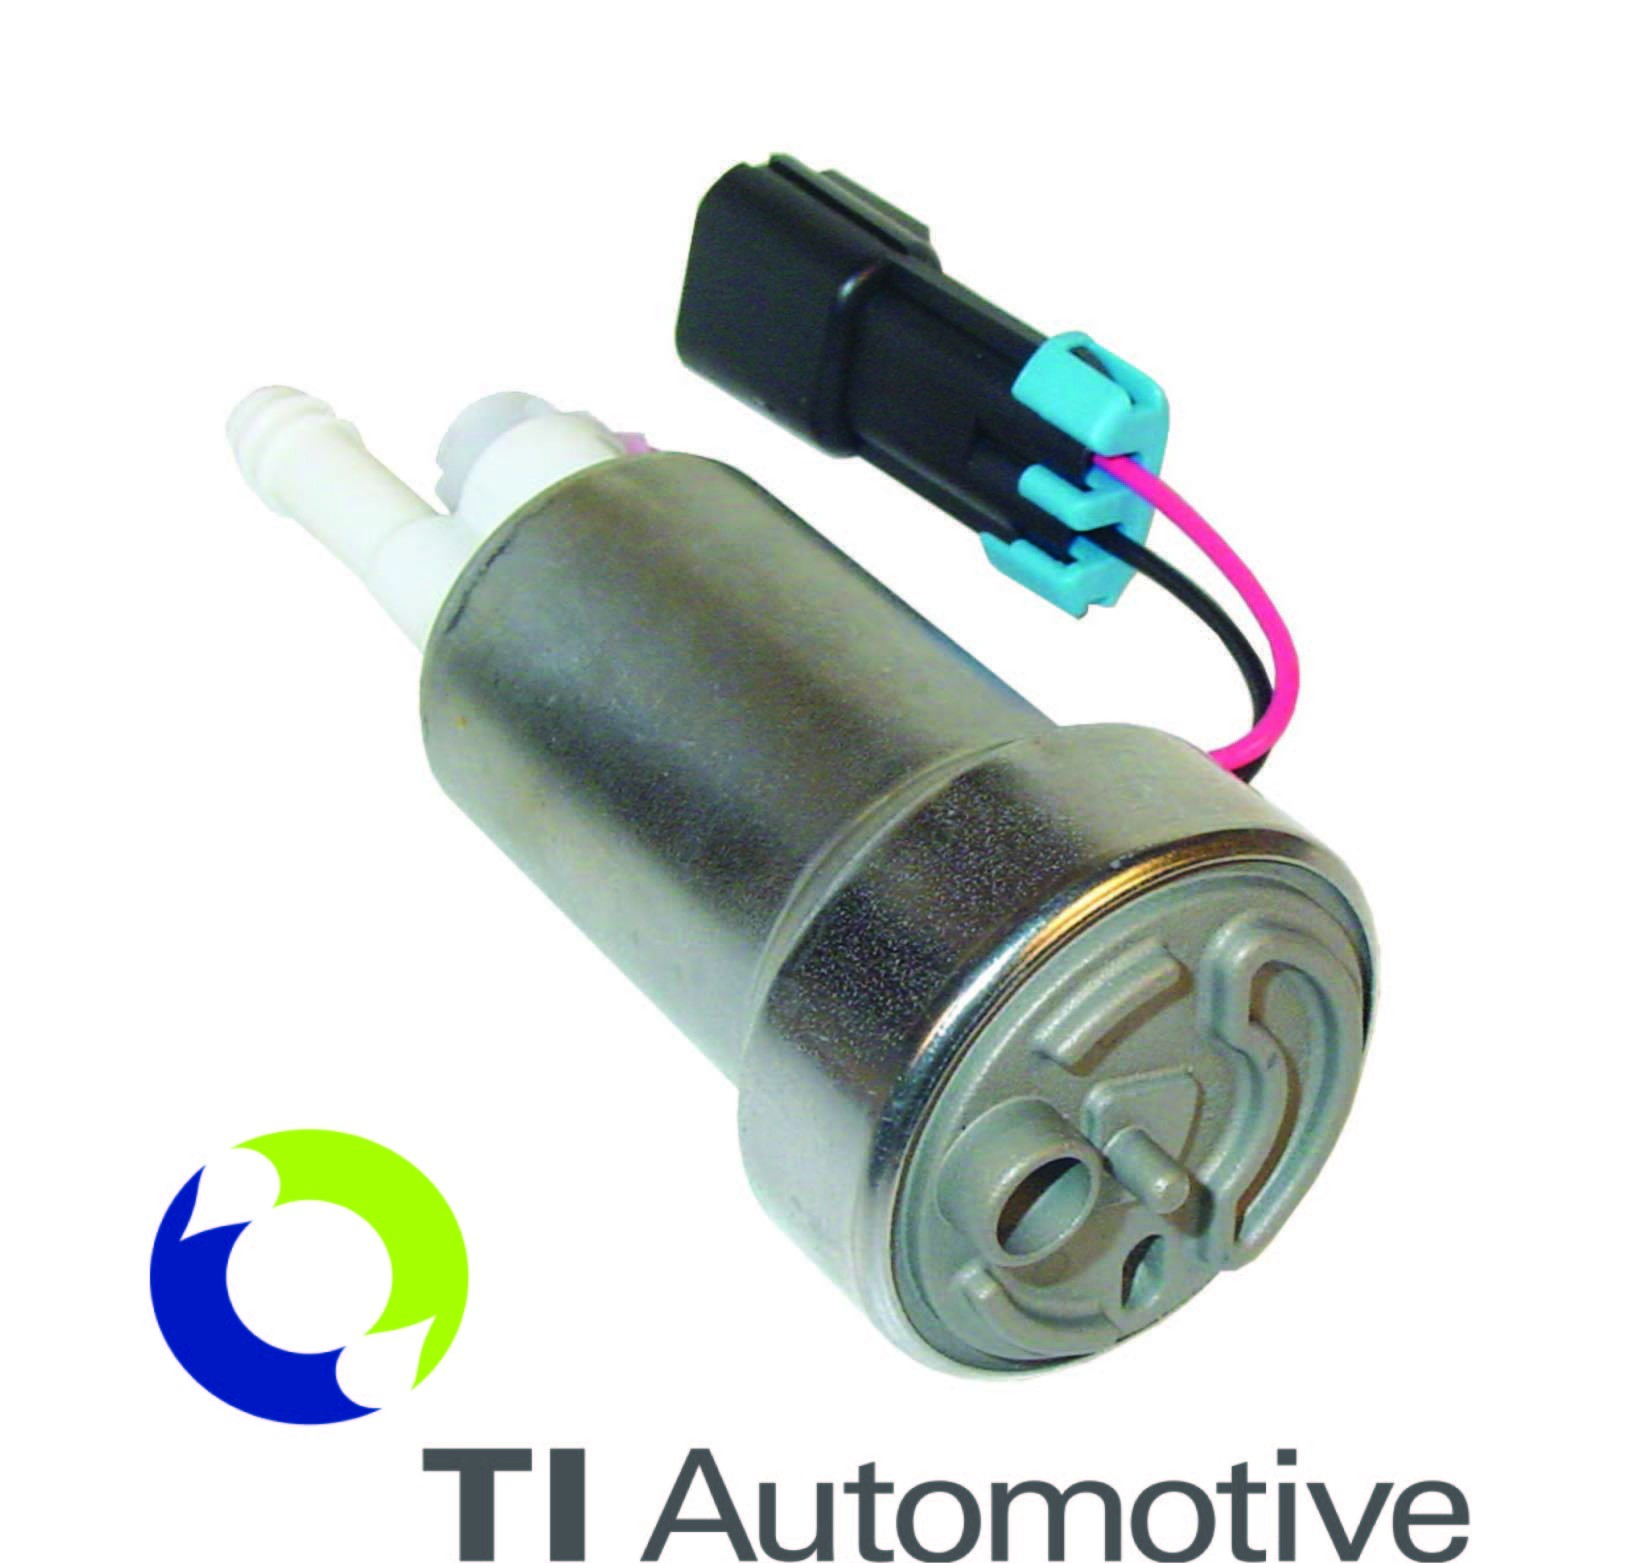 Ti Automotive (Walbro) 450 lph In Tank Motorsport Fuel Pumps